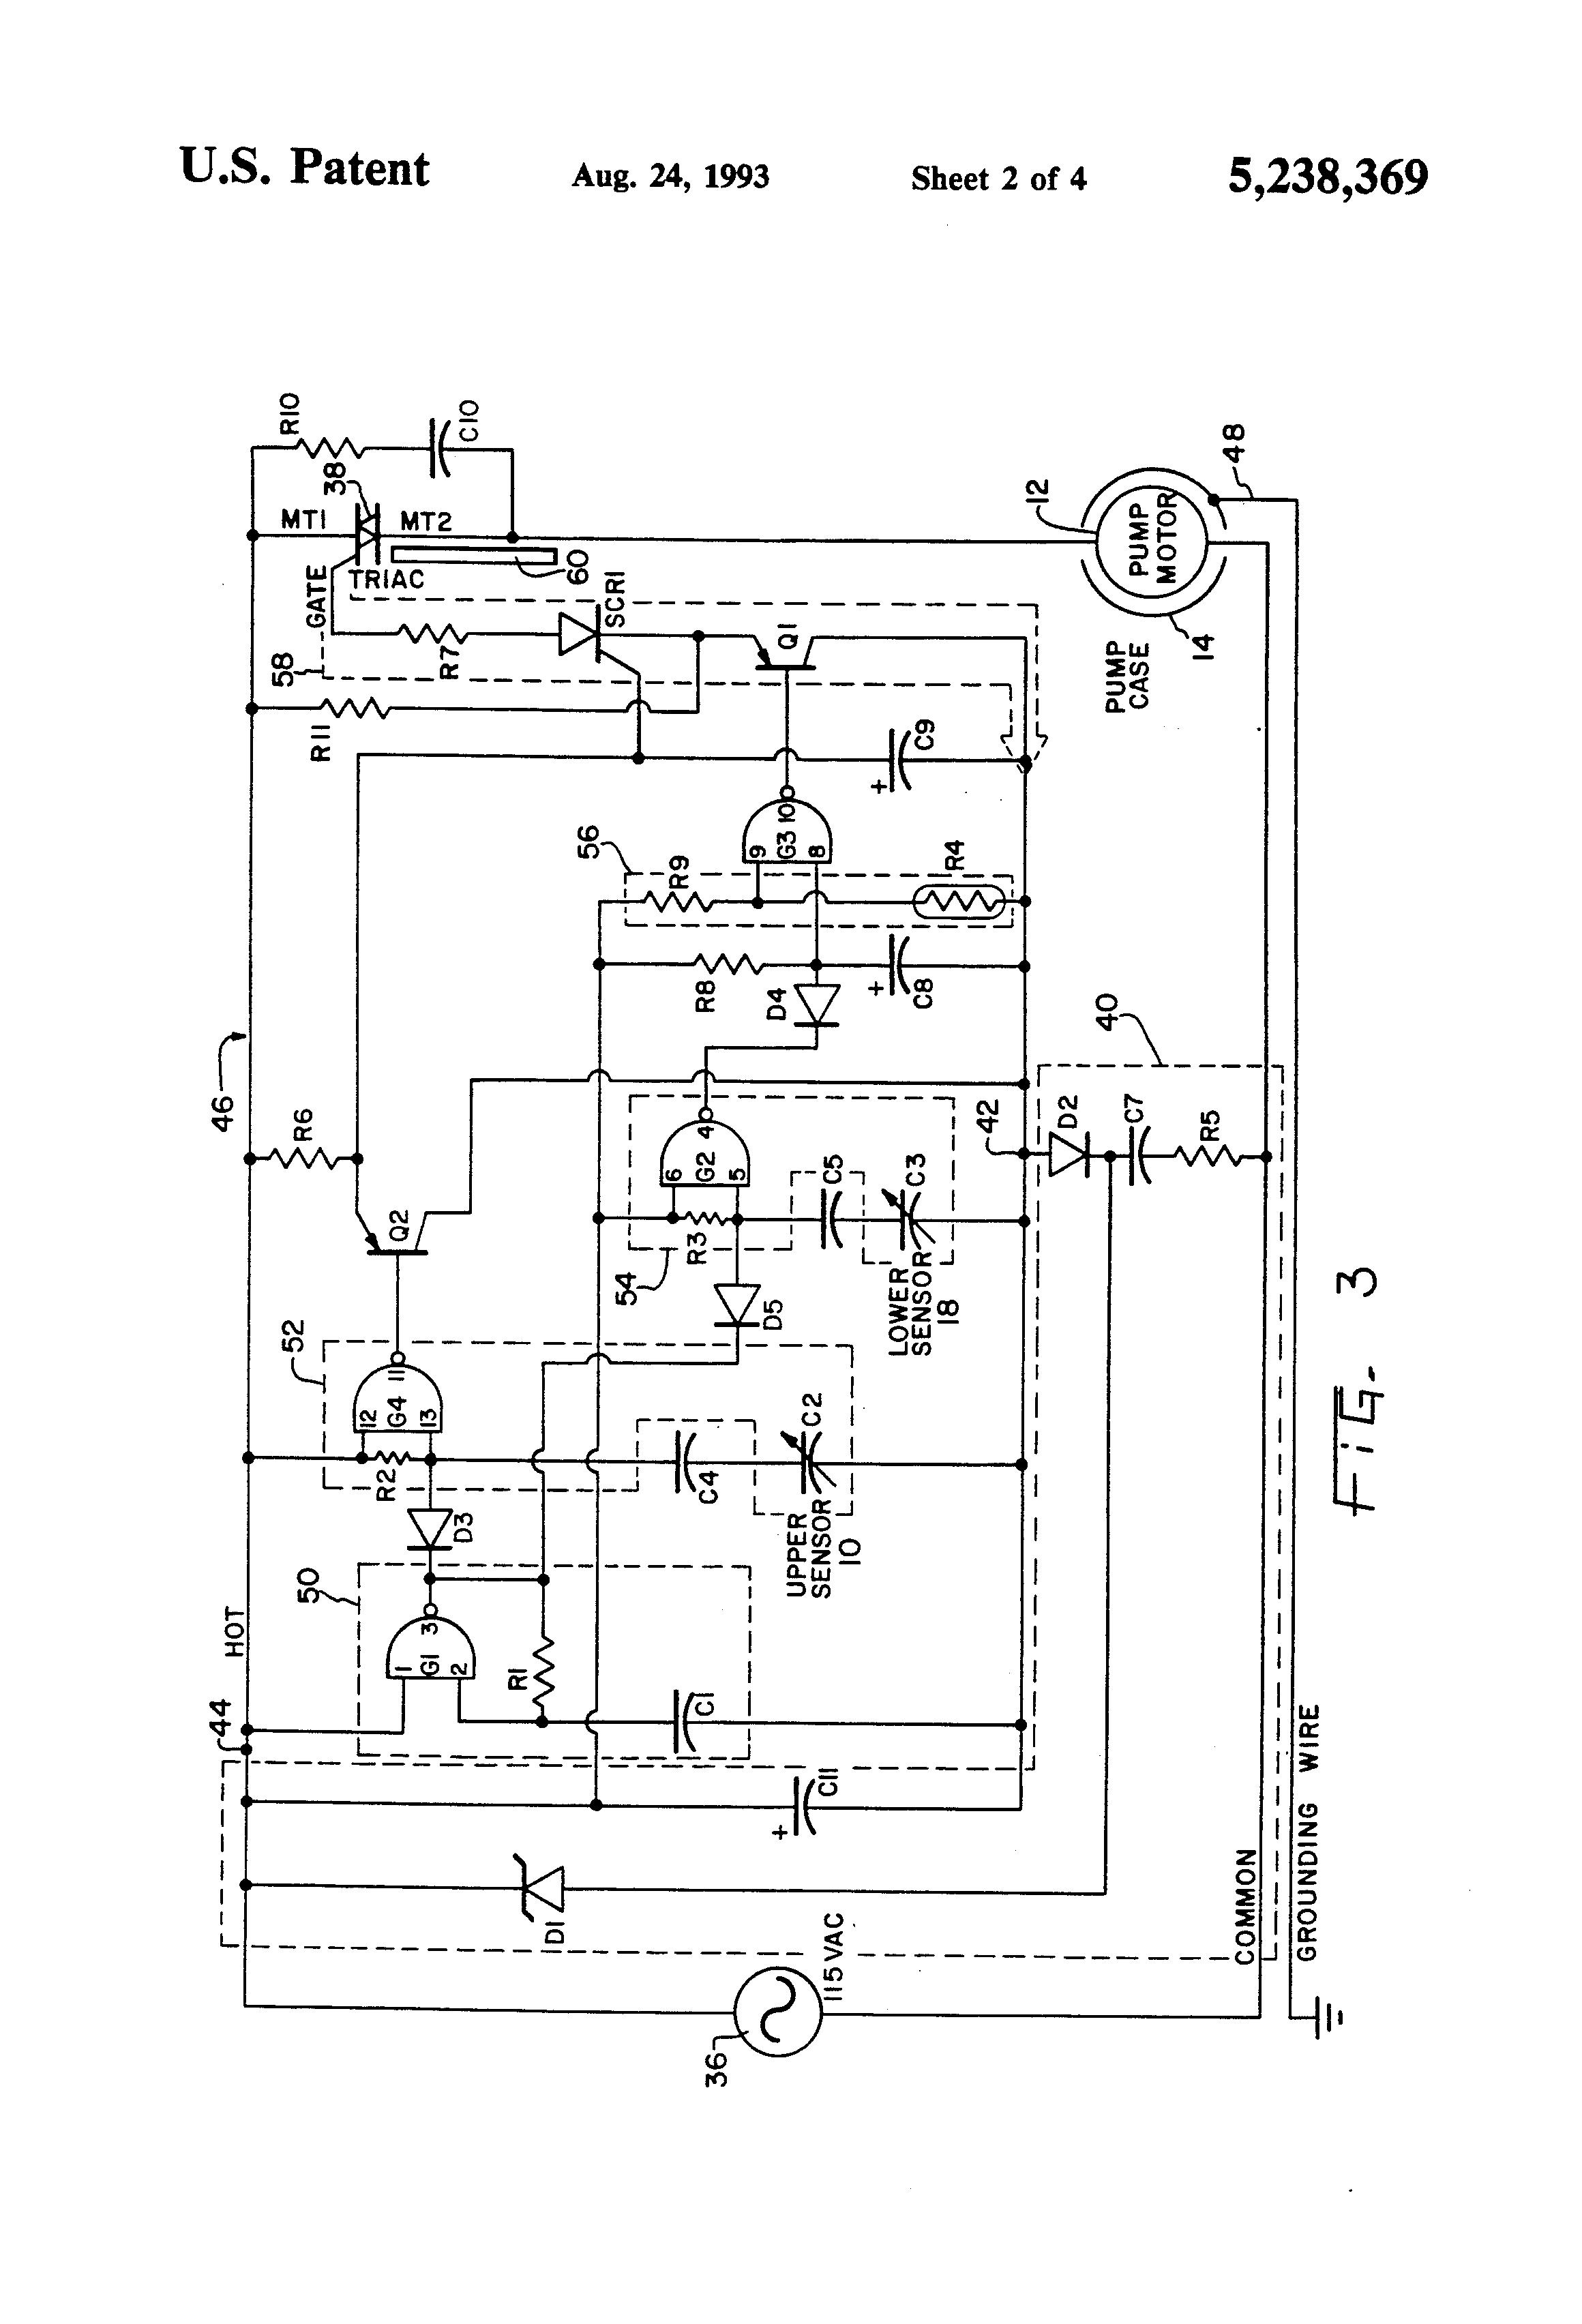 patent us5238369 - liquid level control with capacitive sensors